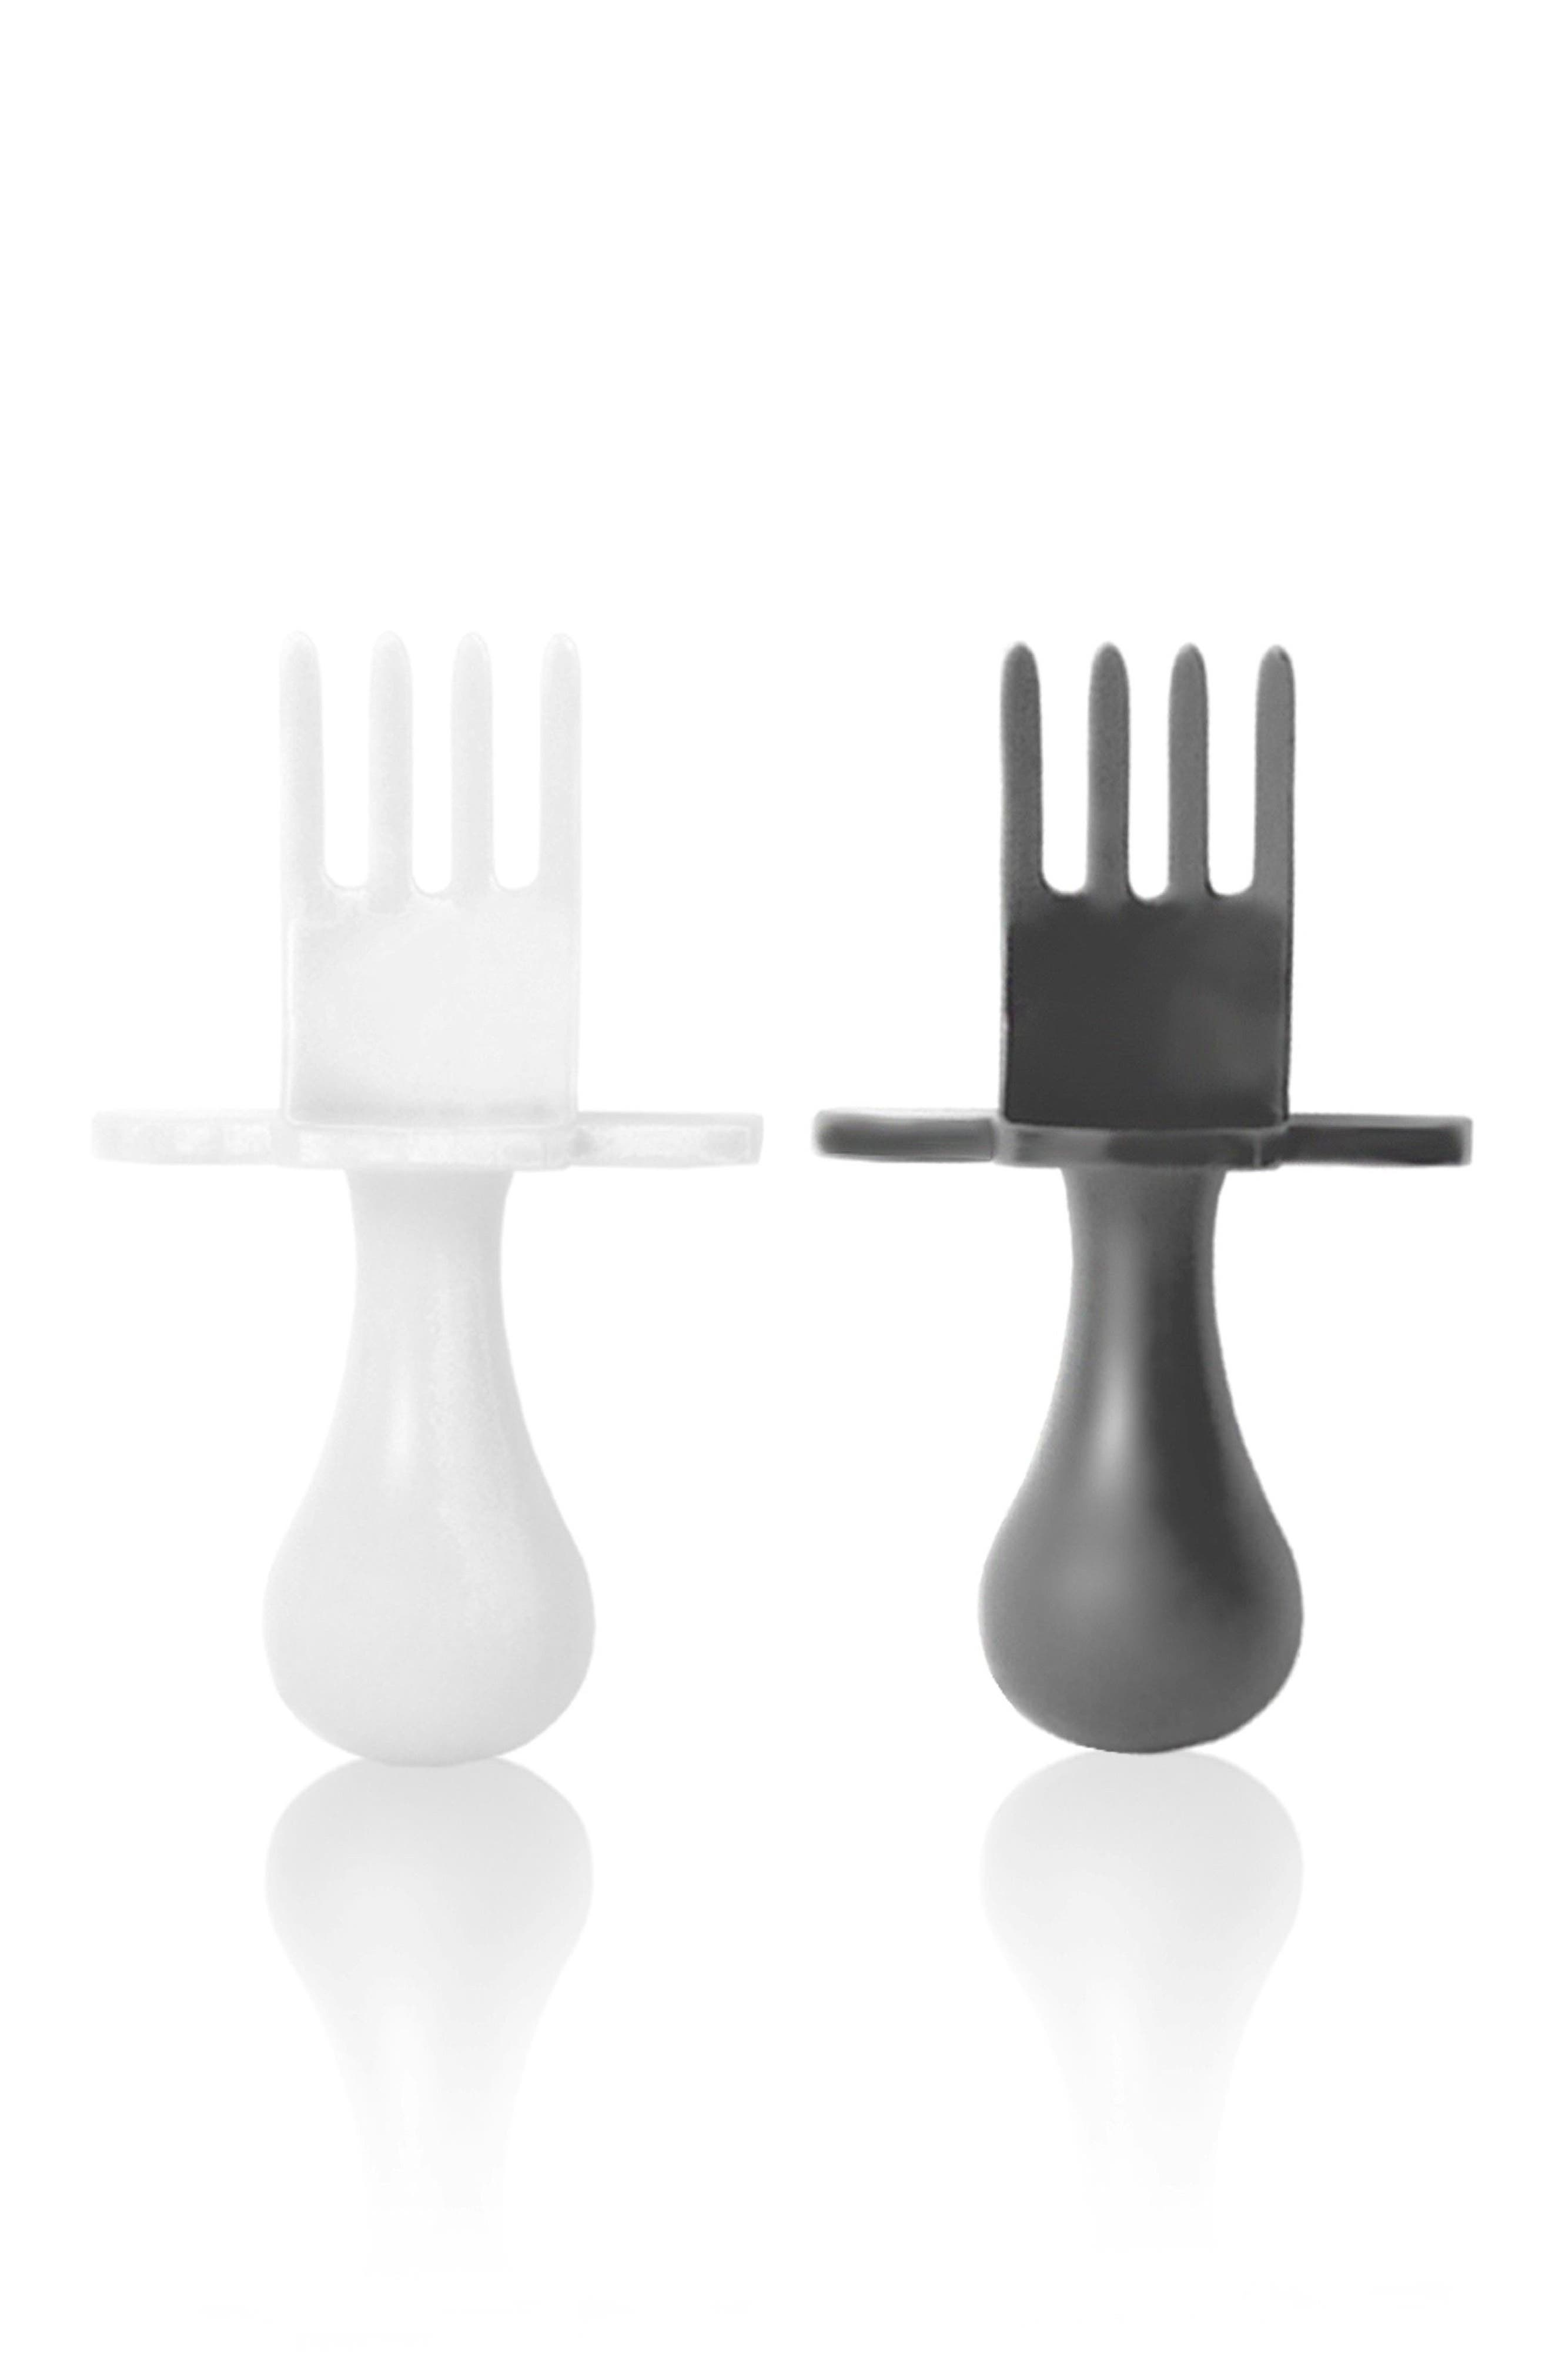 Self Feeding Fork Set,                             Main thumbnail 1, color,                             MIX WHITE AND GRAY